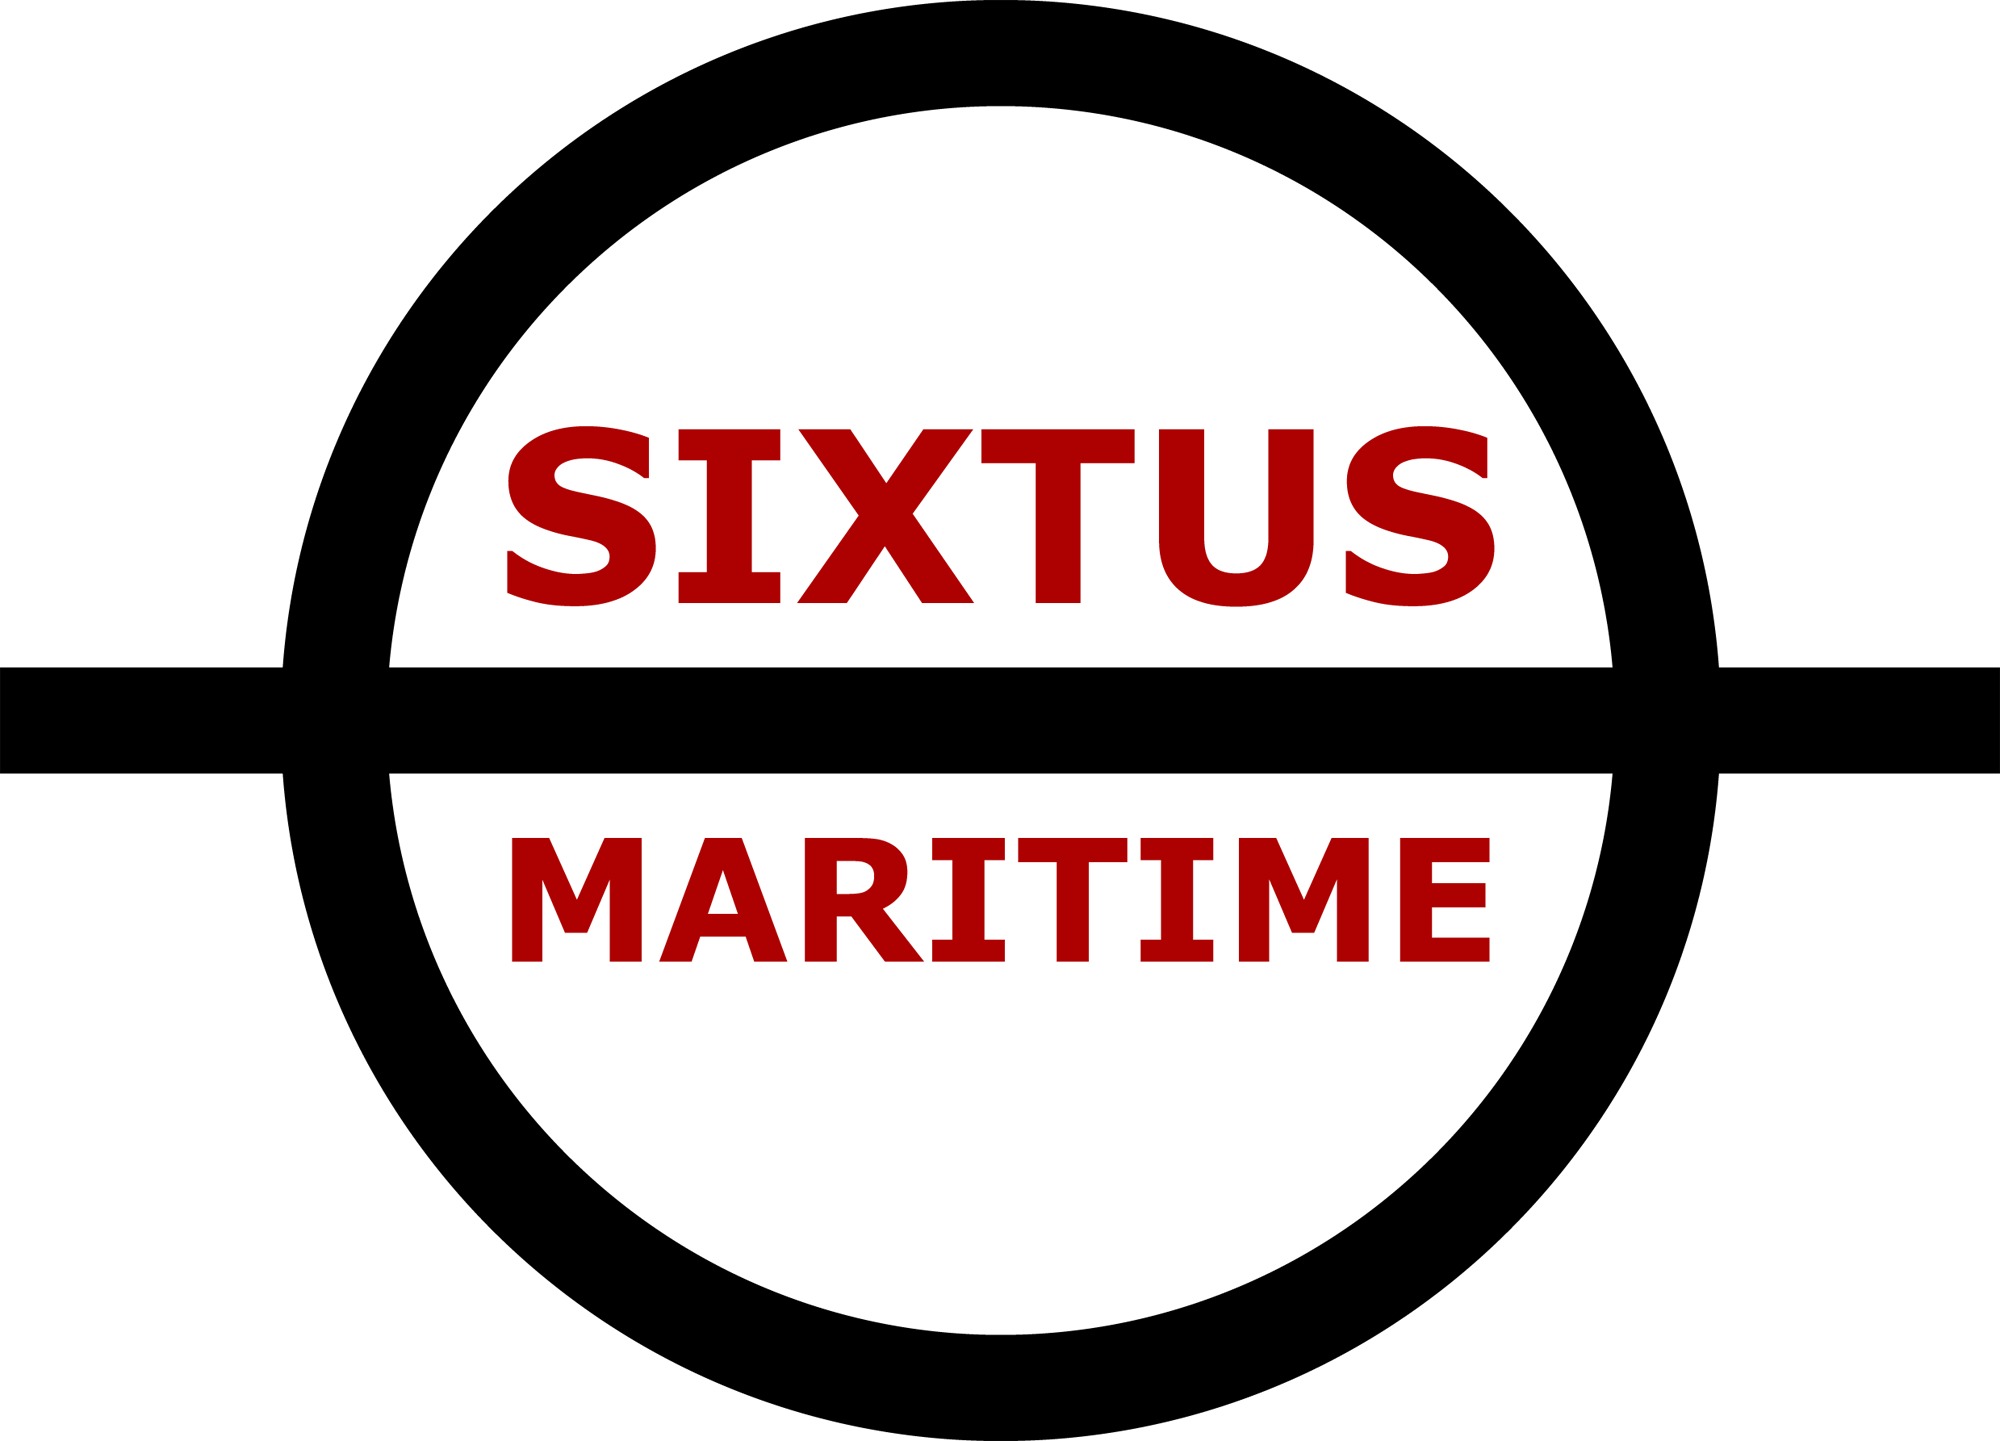 sixtus_logo_2000px